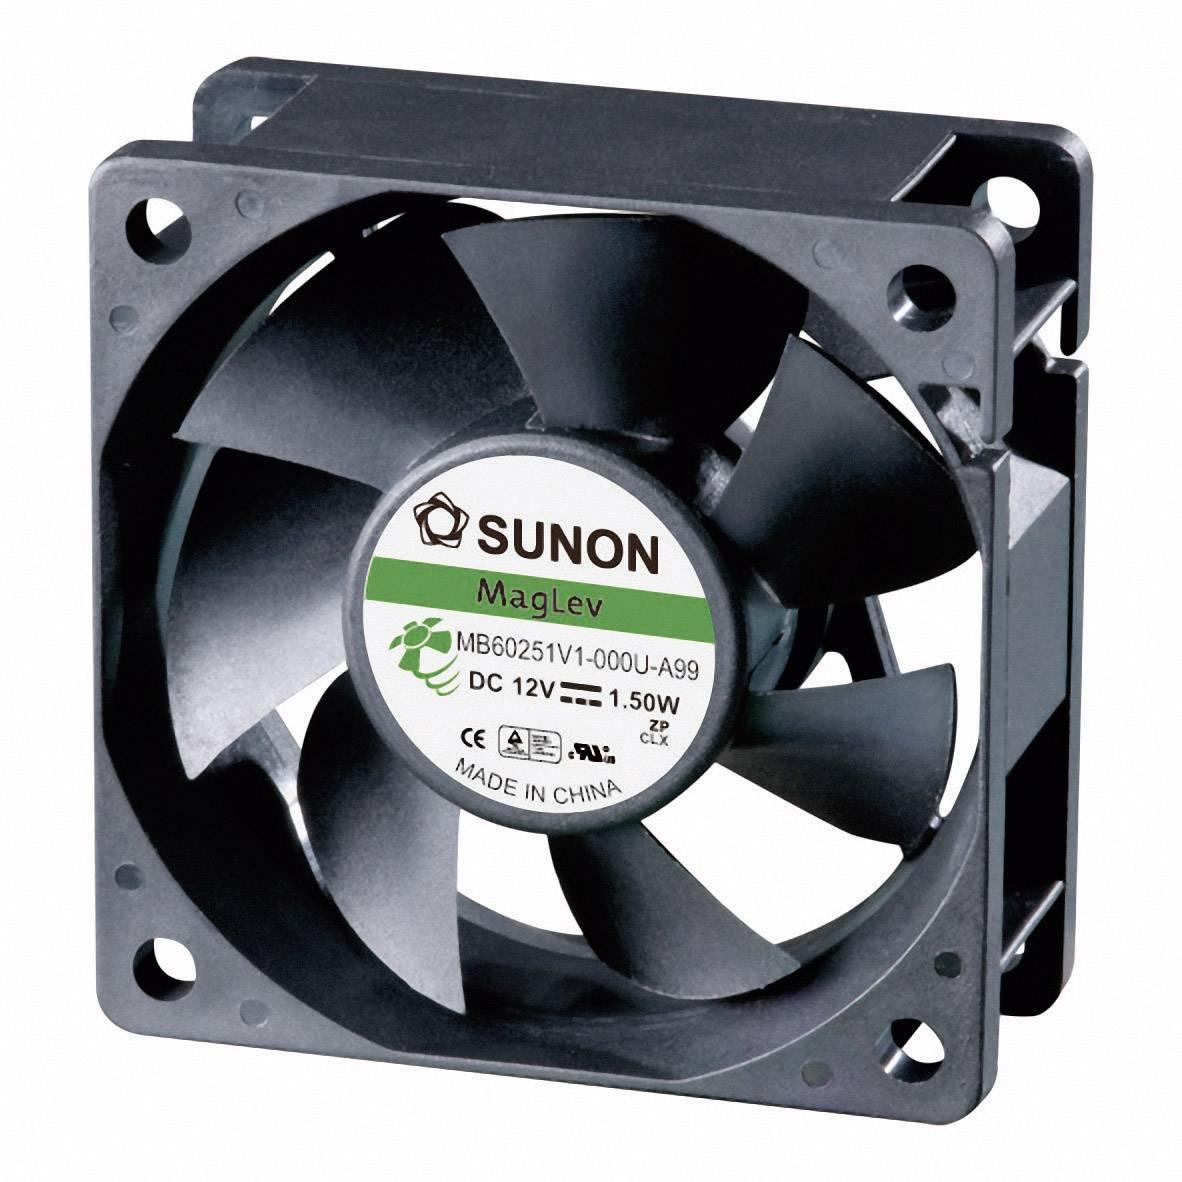 Axiálny ventilátor Sunon MB60251V1-0000-A99 MB60251V1-0000-A99, 12 V/DC, 33.5 dB, (d x š x v) 60 x 60 x 25 mm